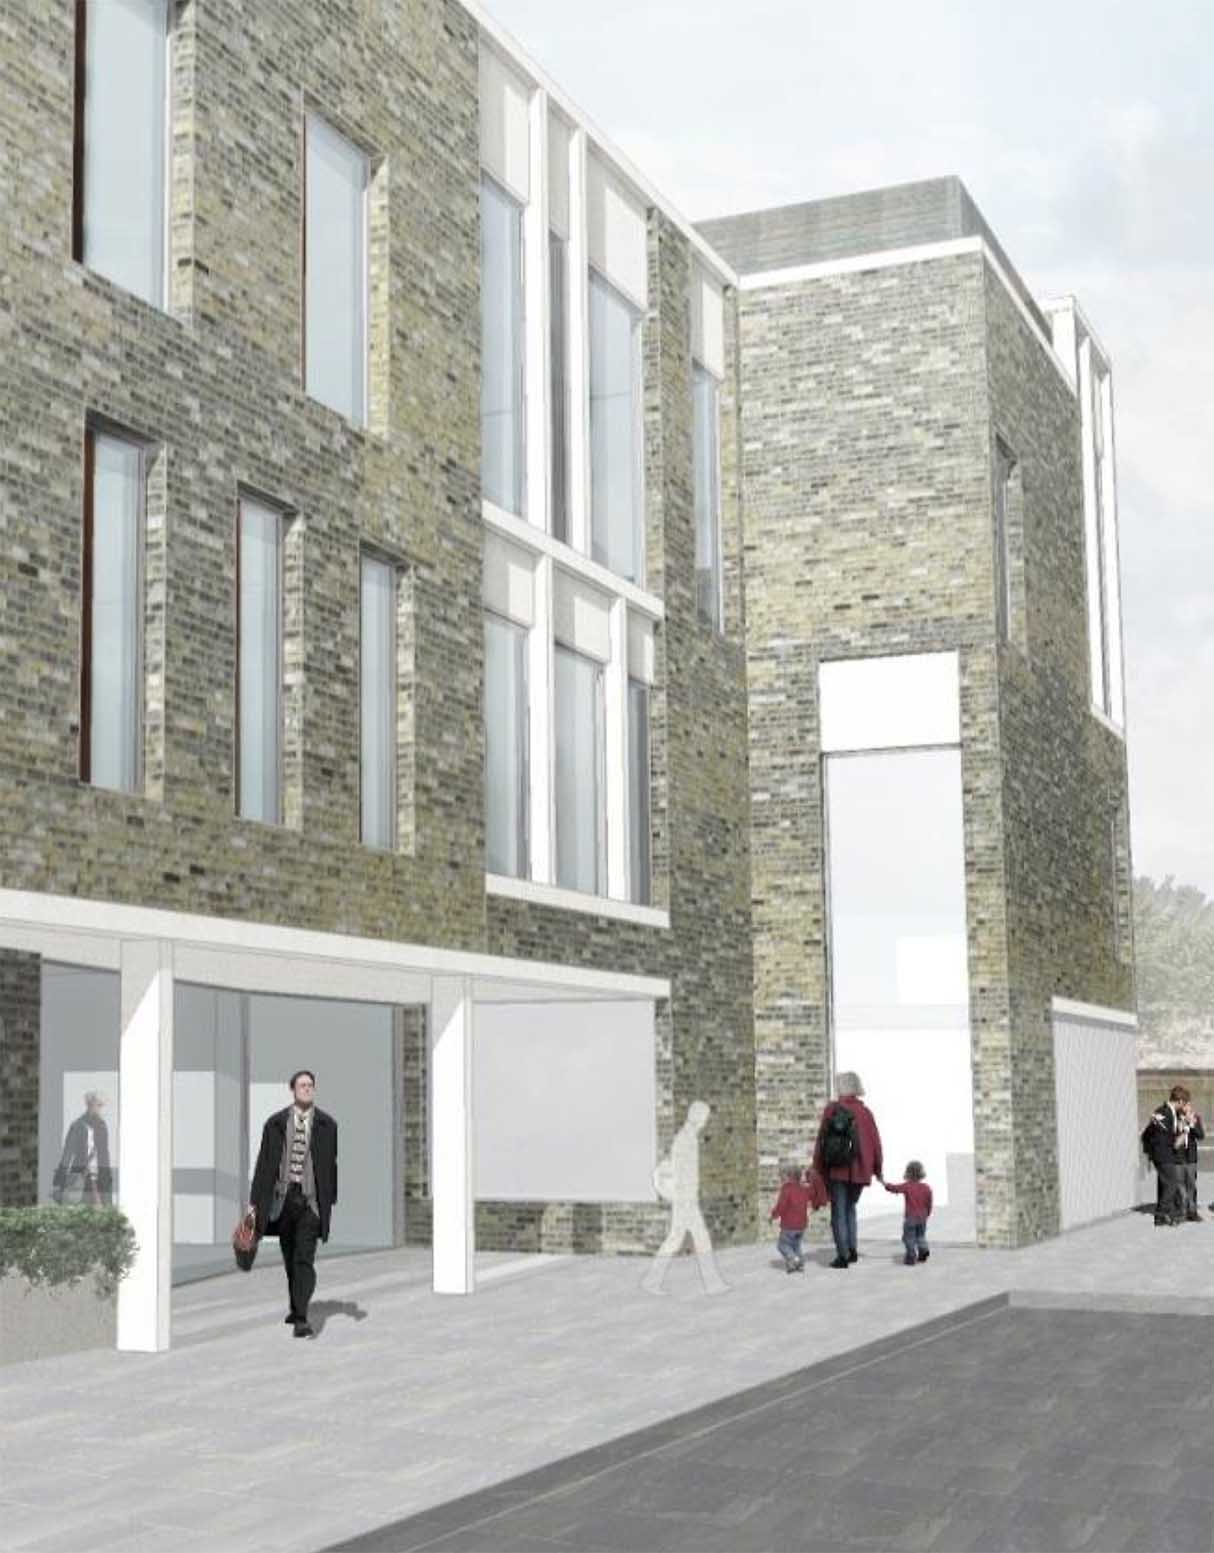 New Gorbals Health & Care Centre